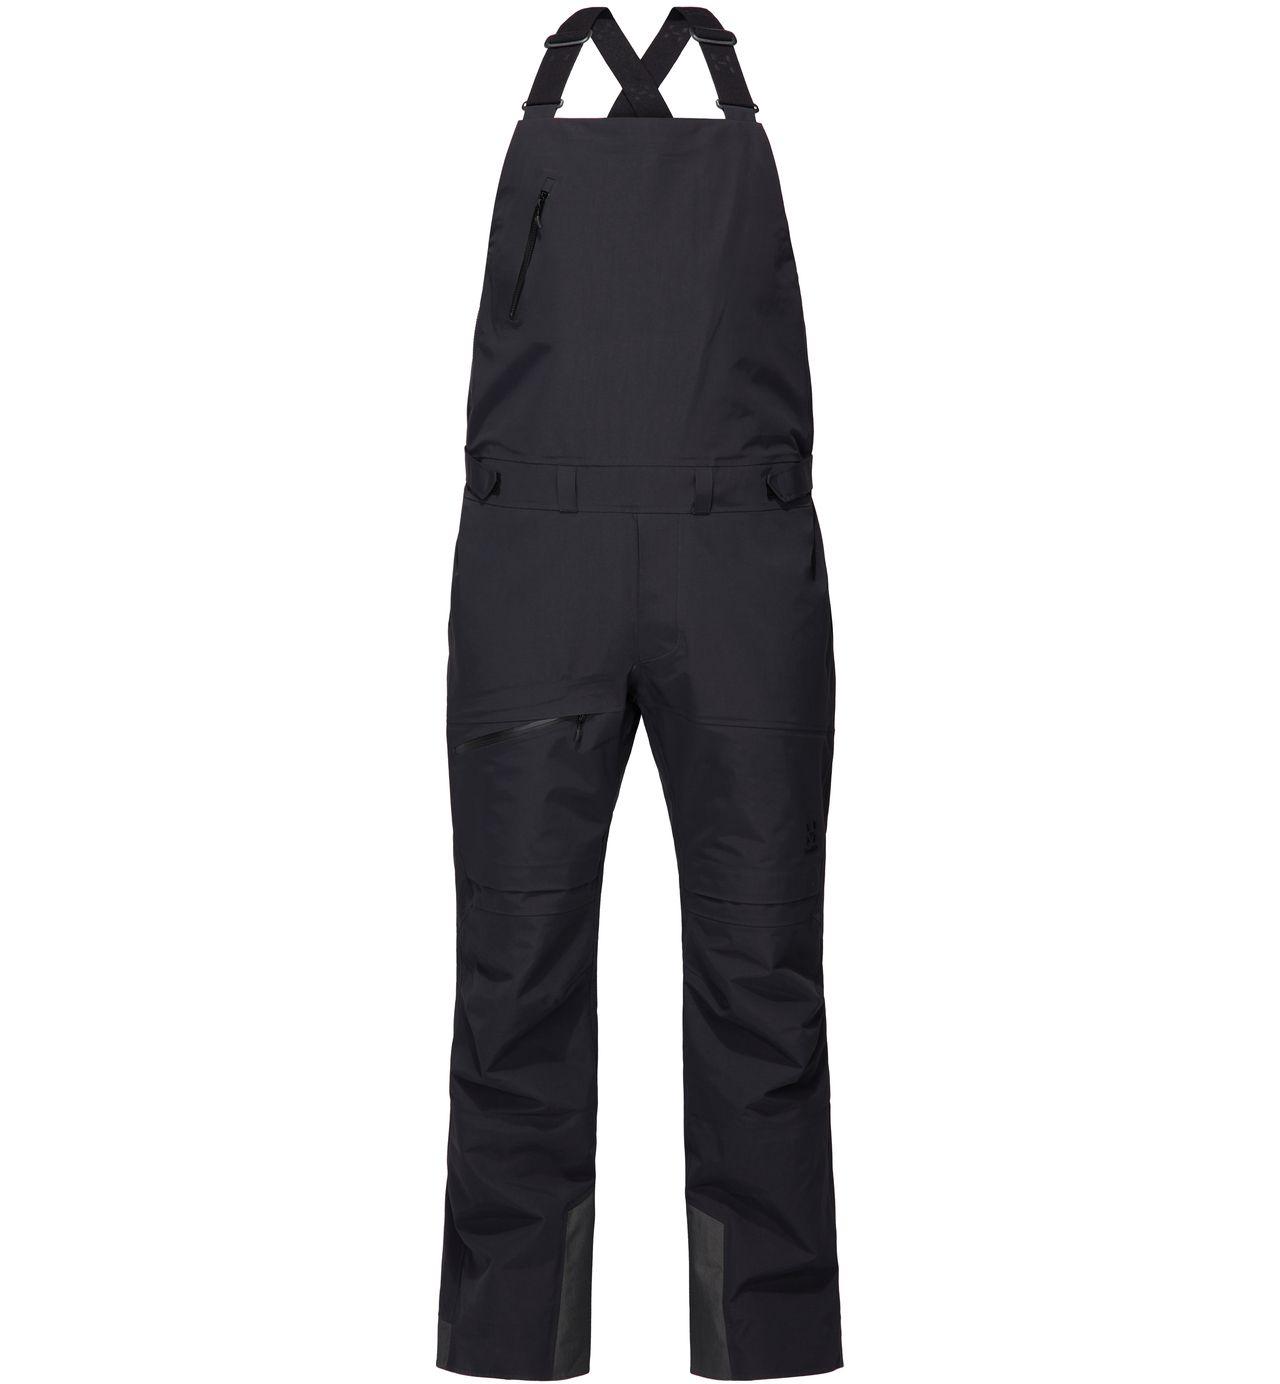 Haglofs pantalon